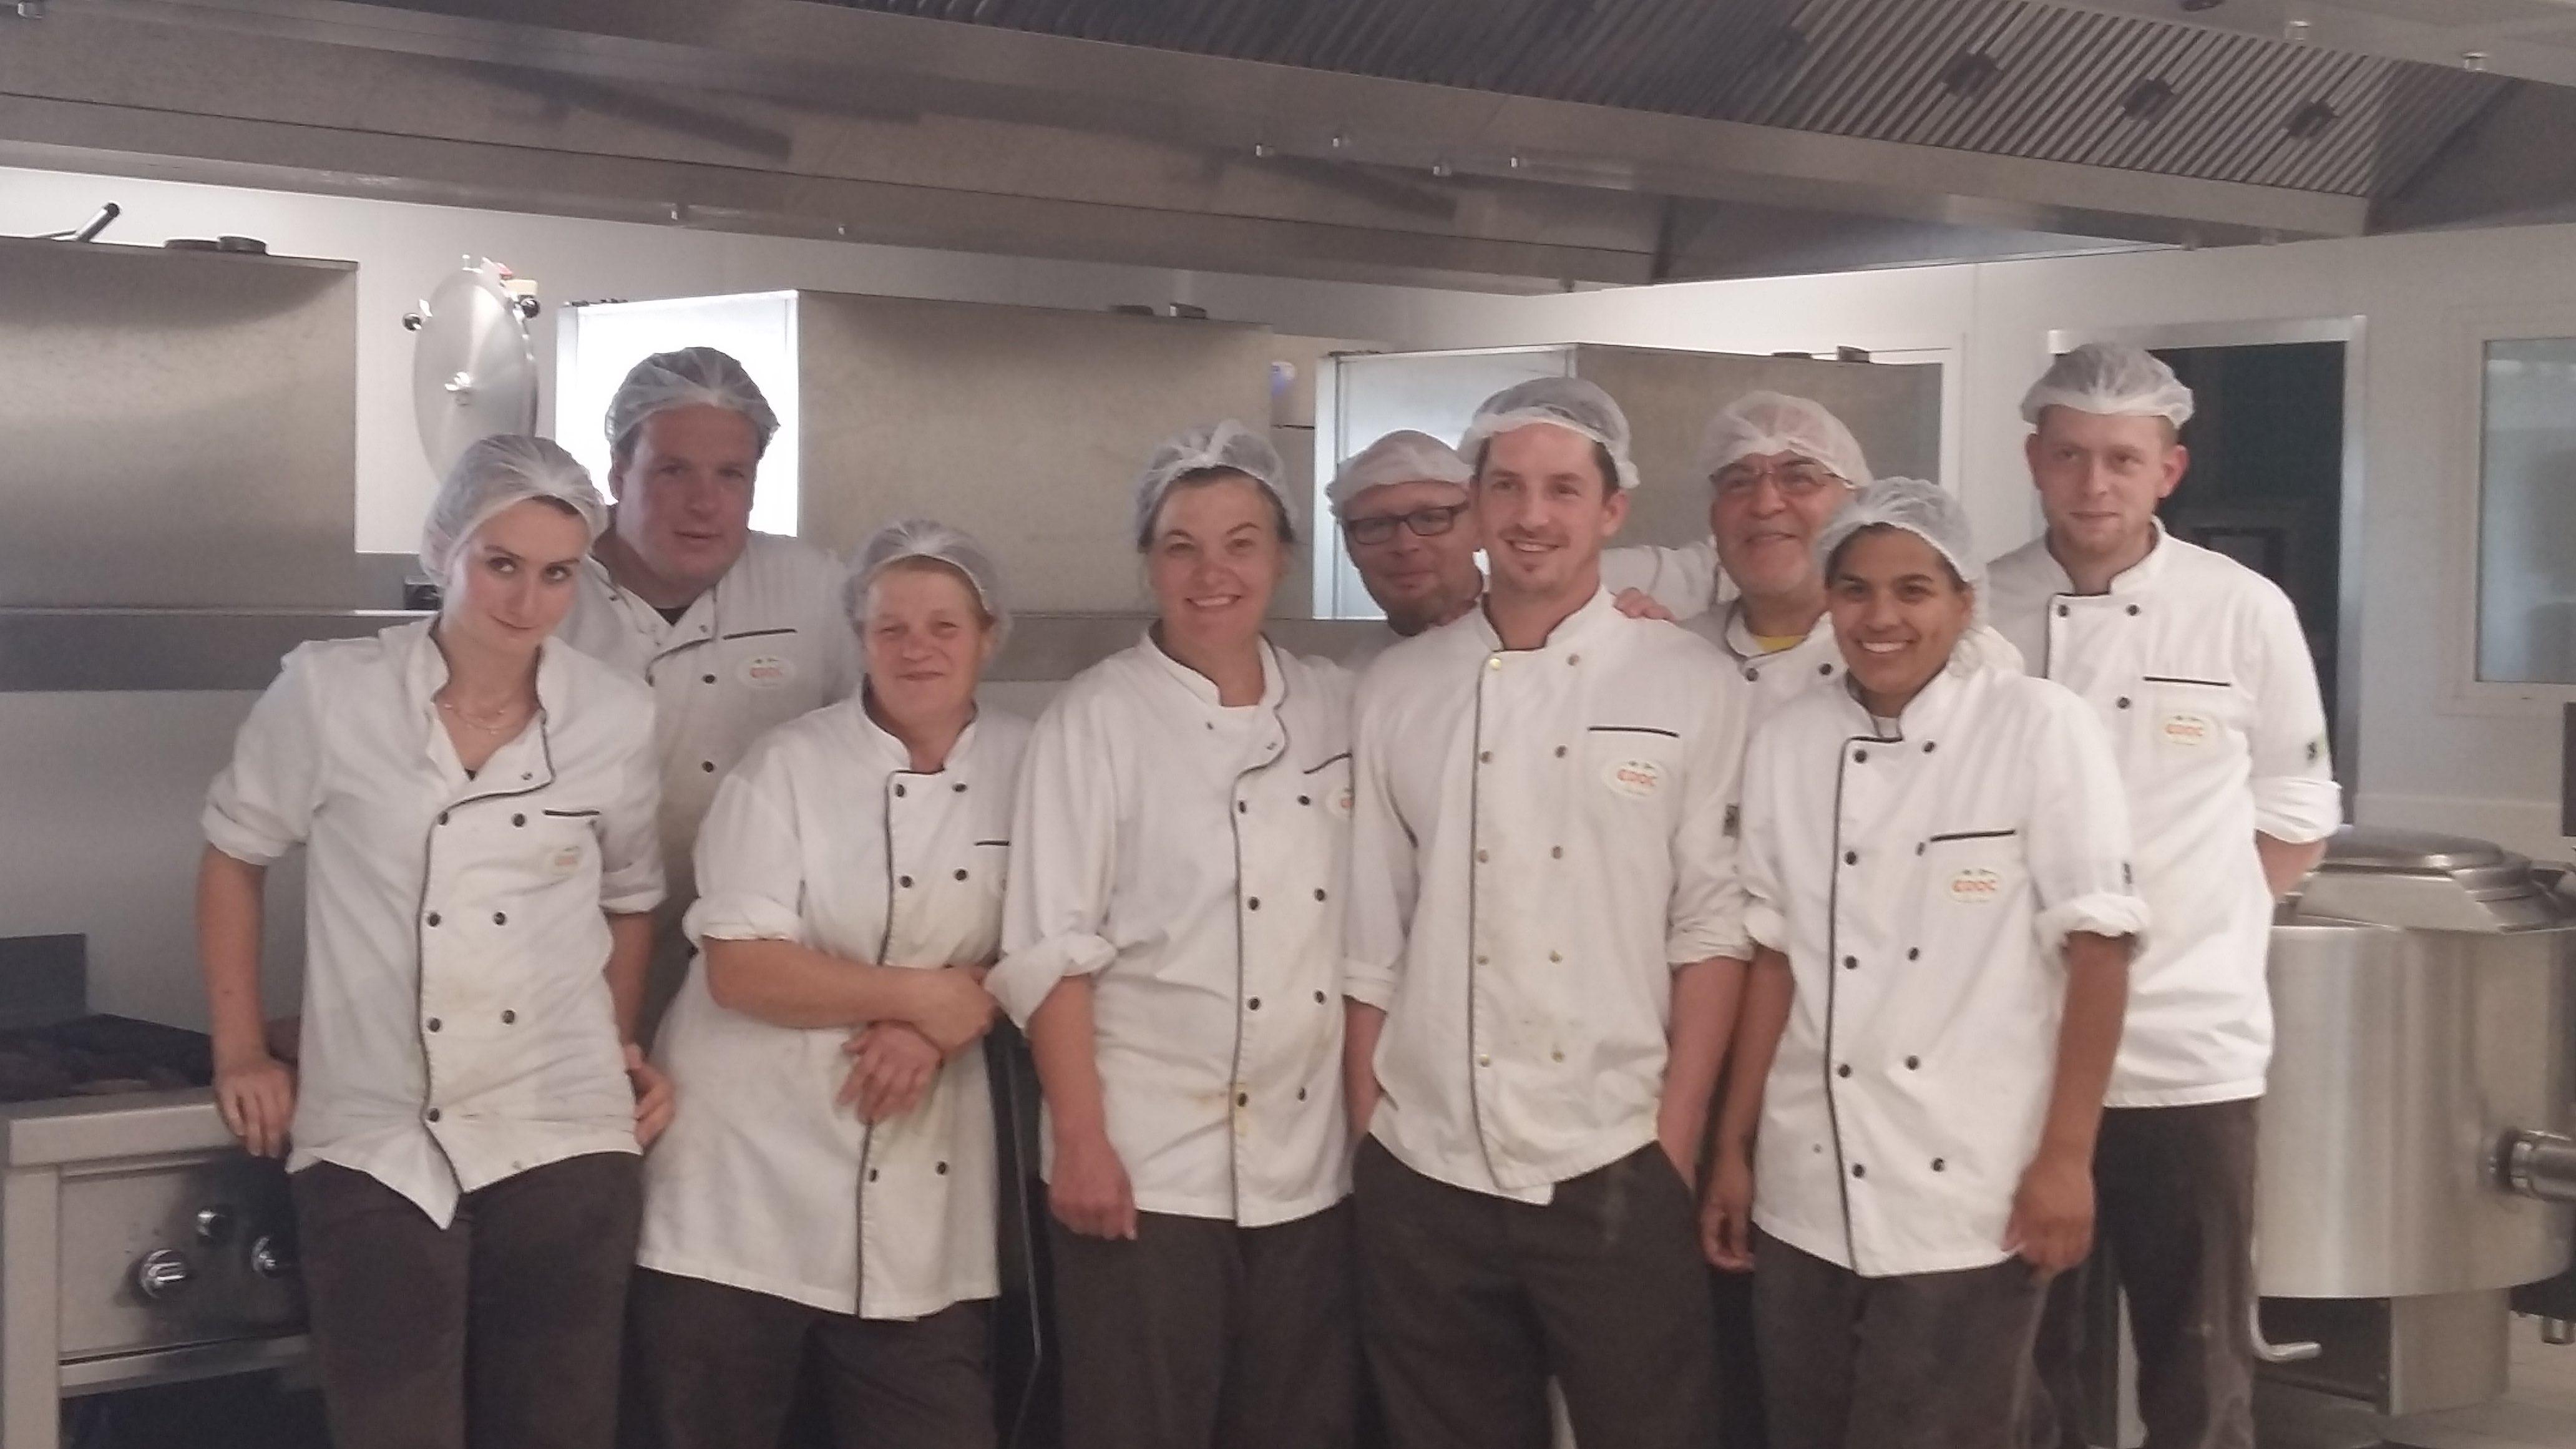 équipe cuisine croc la vie